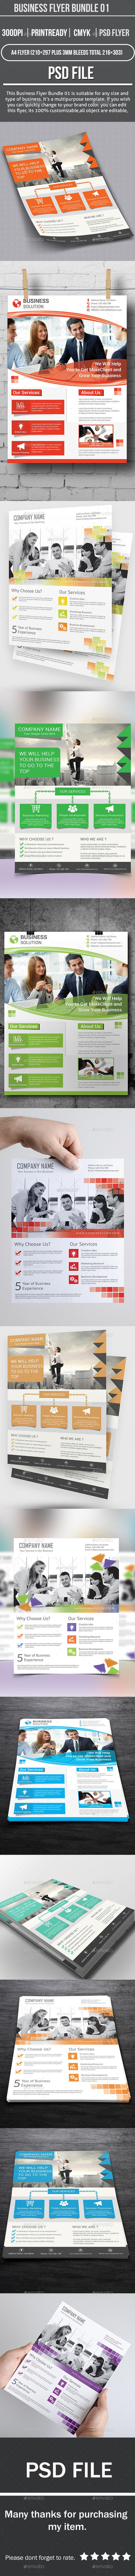 GraphicRiver Business Flyer Bundle 01 9835498